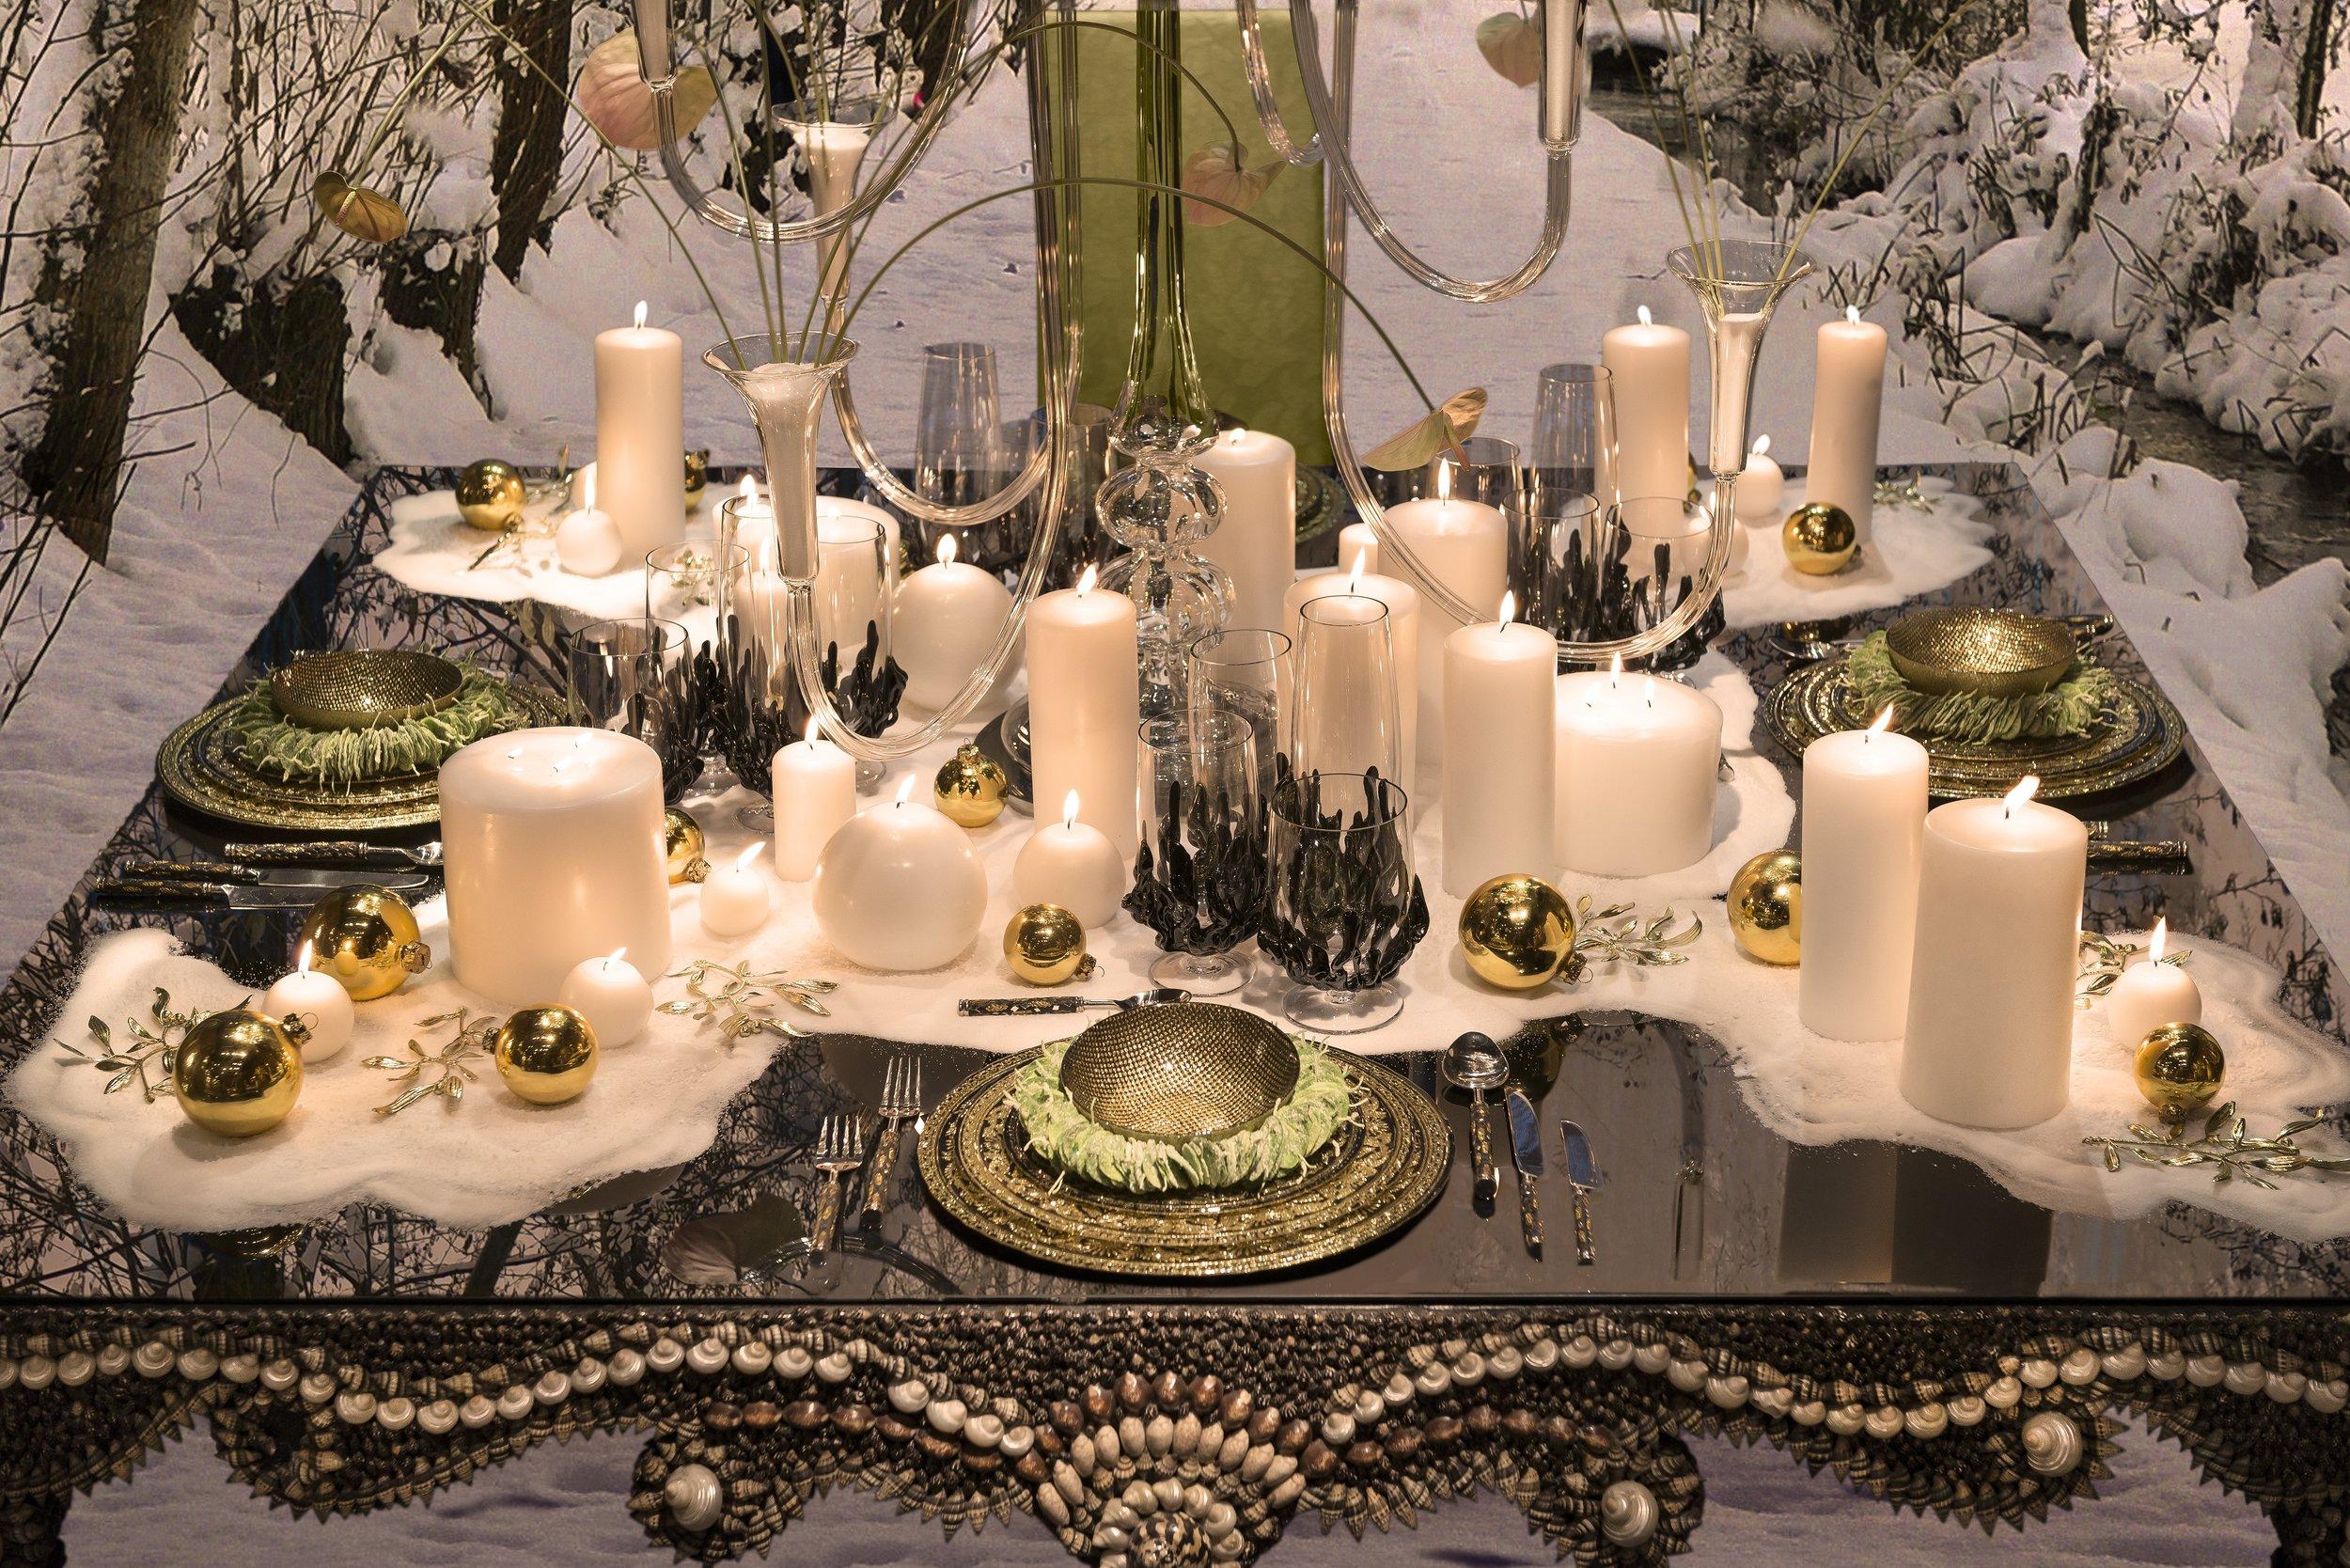 Interiors Advent Calendar - Christmas dining table by VG New Trend @ Masha Shapiro Agency.jpg